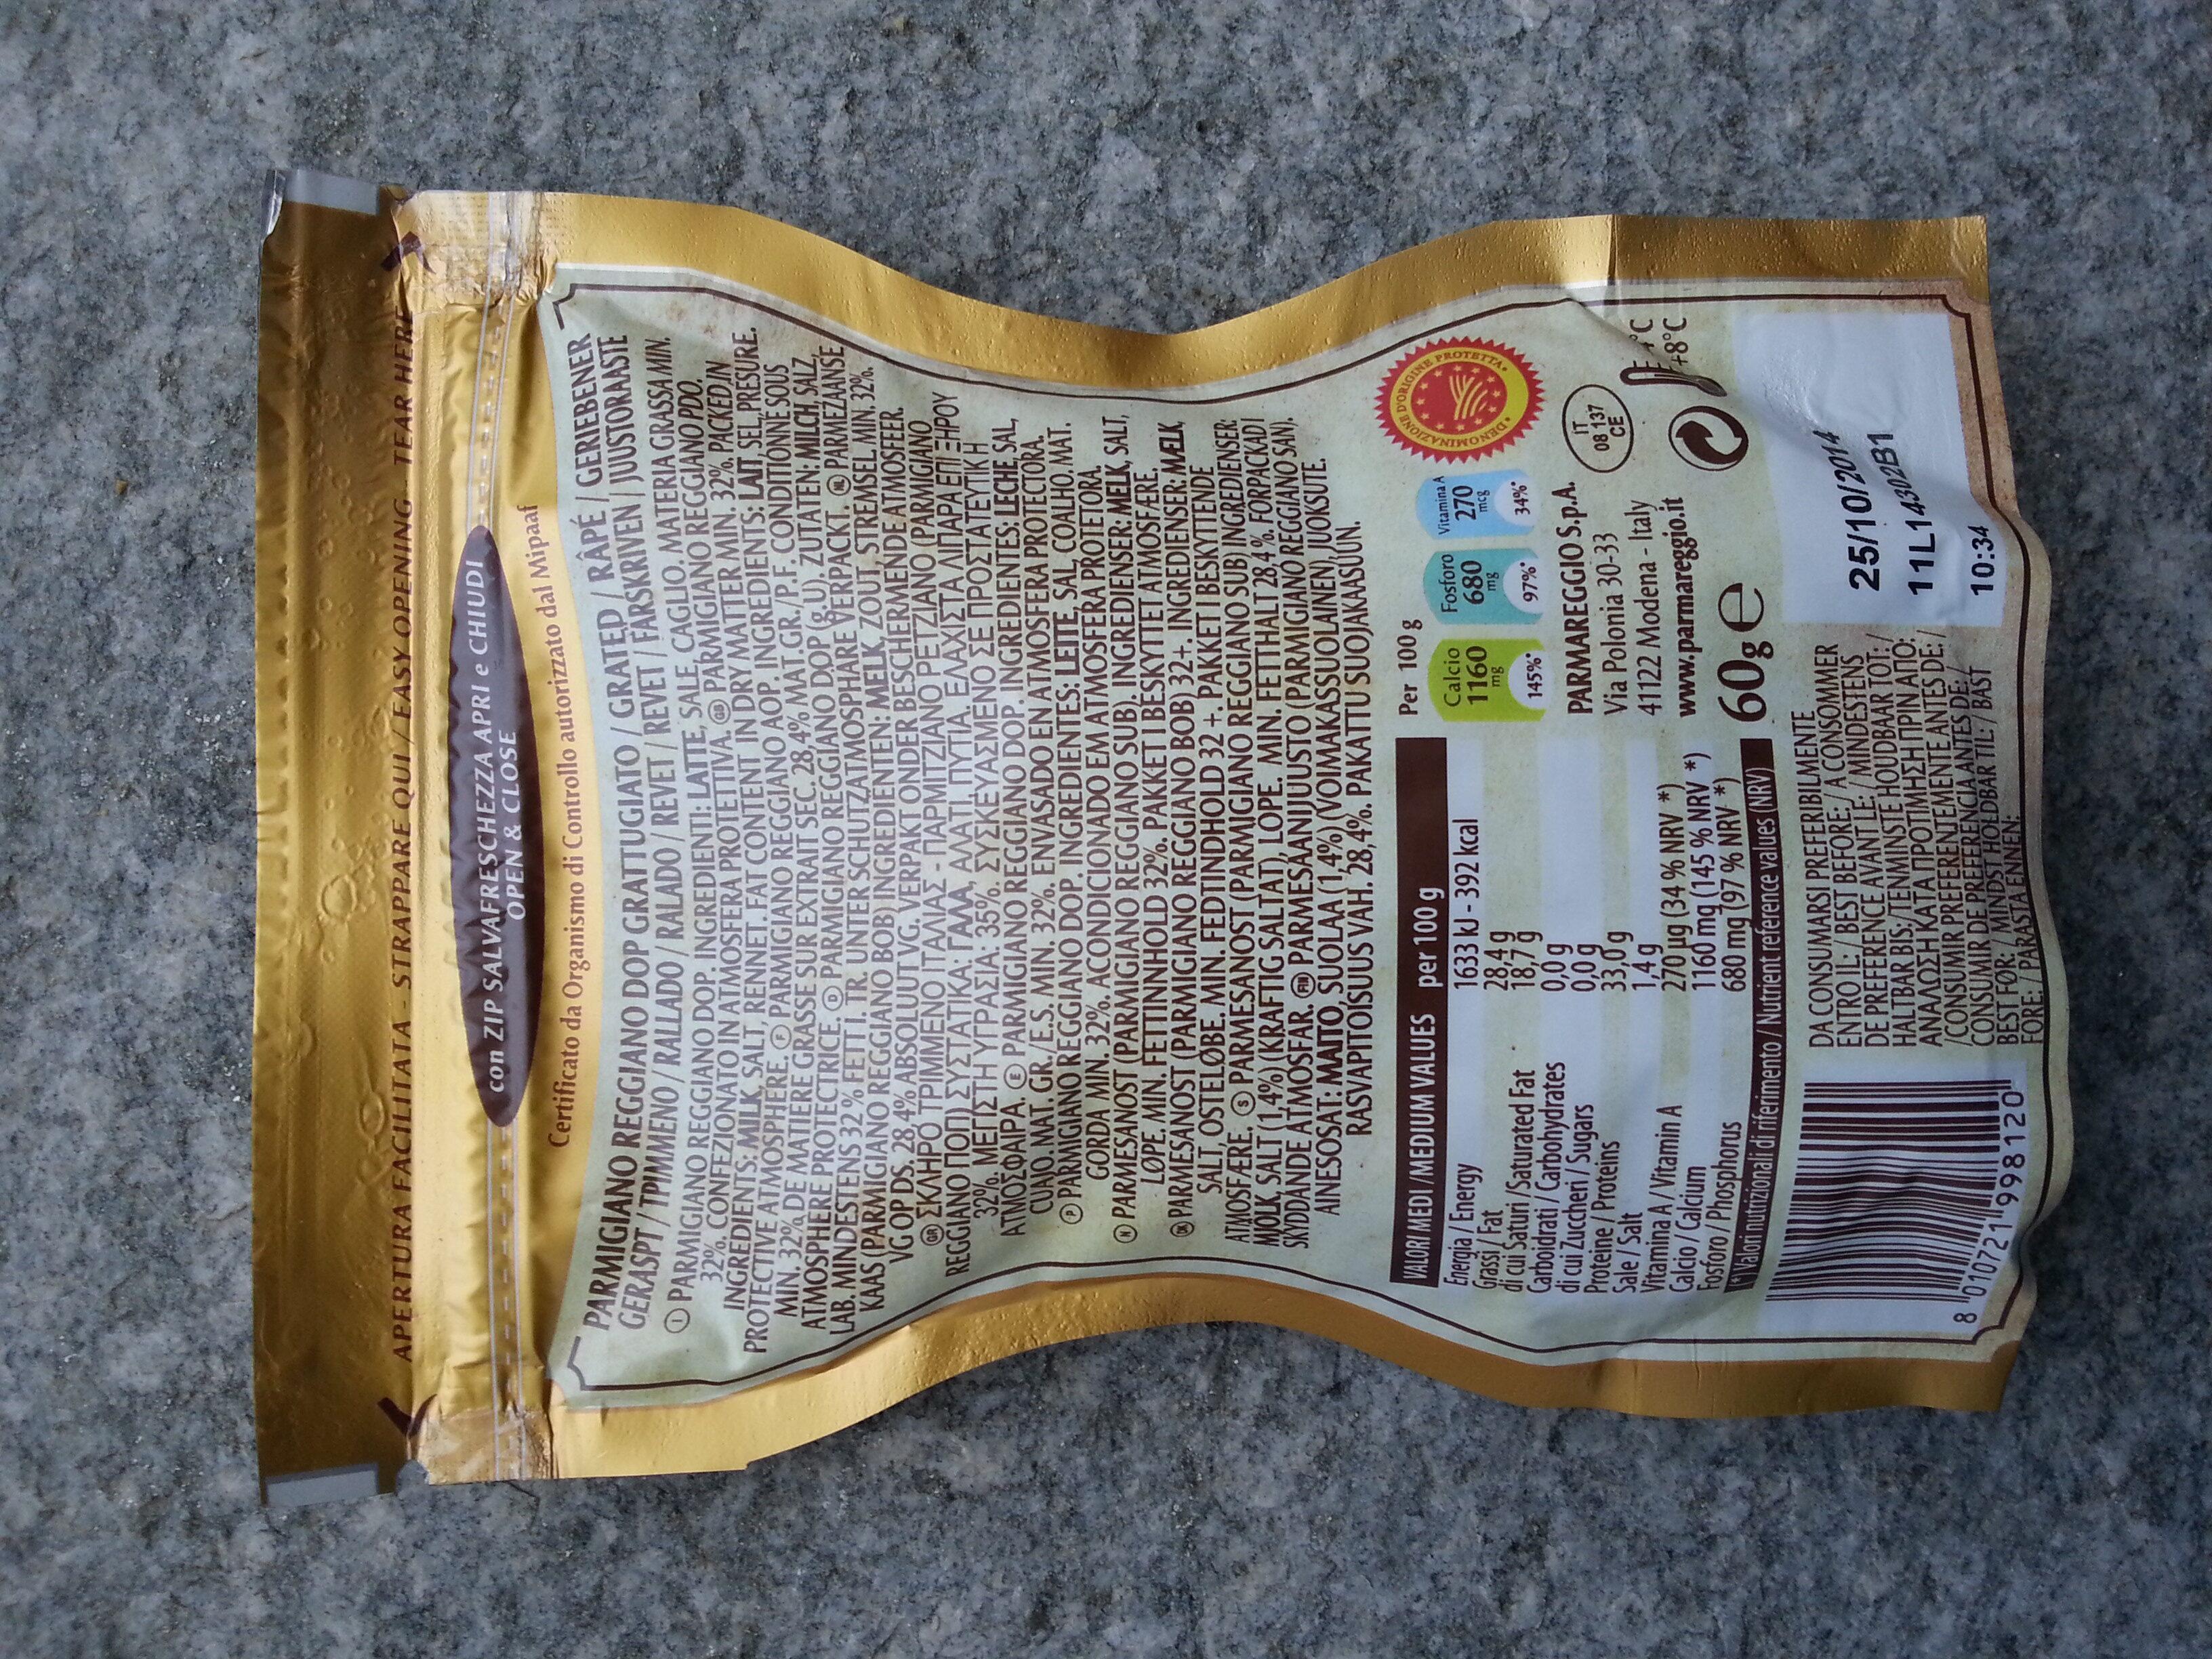 Parmareggio - Parmigiano reggiano DOP 30 mesi grattugiato - Ingredientes